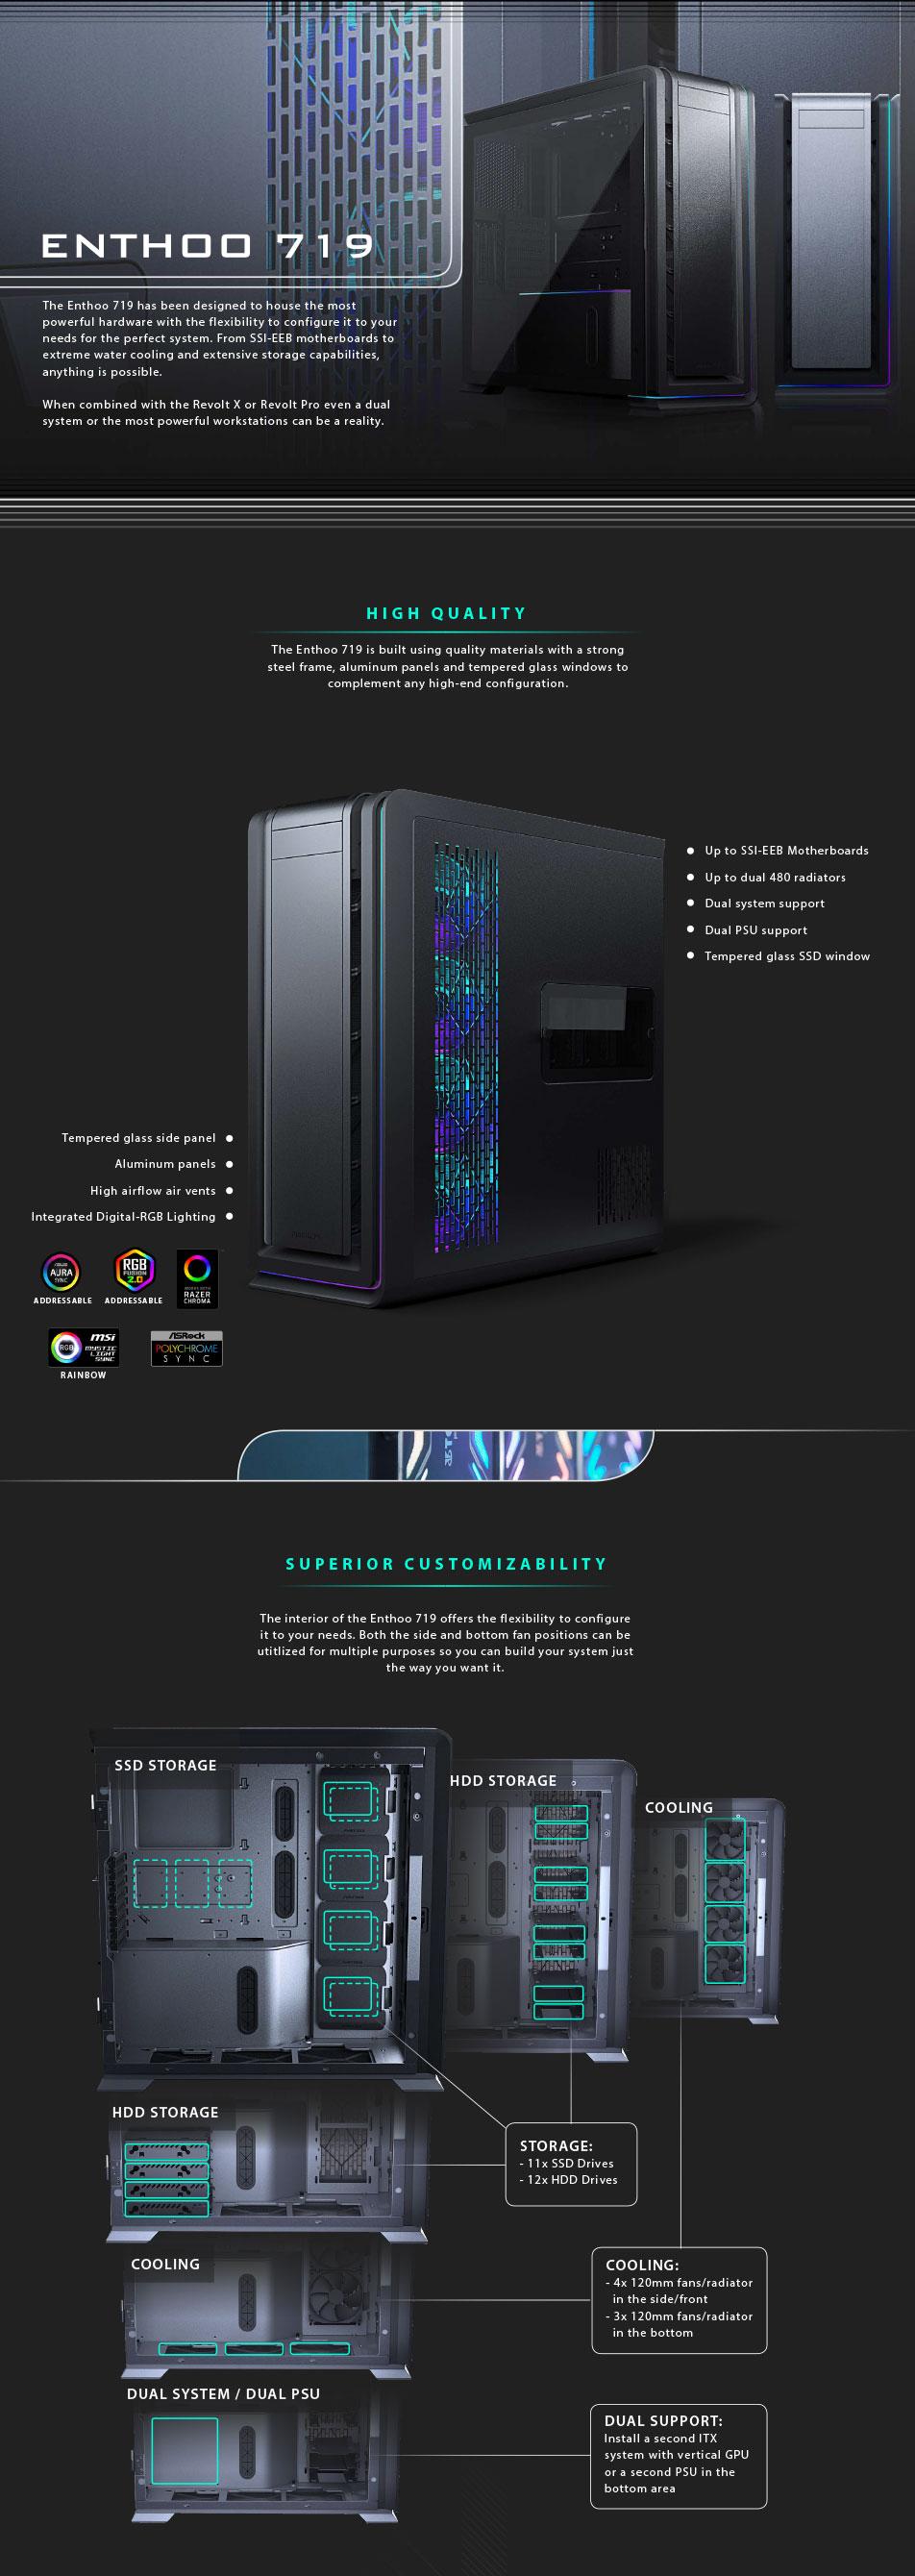 Phanteks Enthoo 719 D-RGB TG Full Tower Case Satin Black features